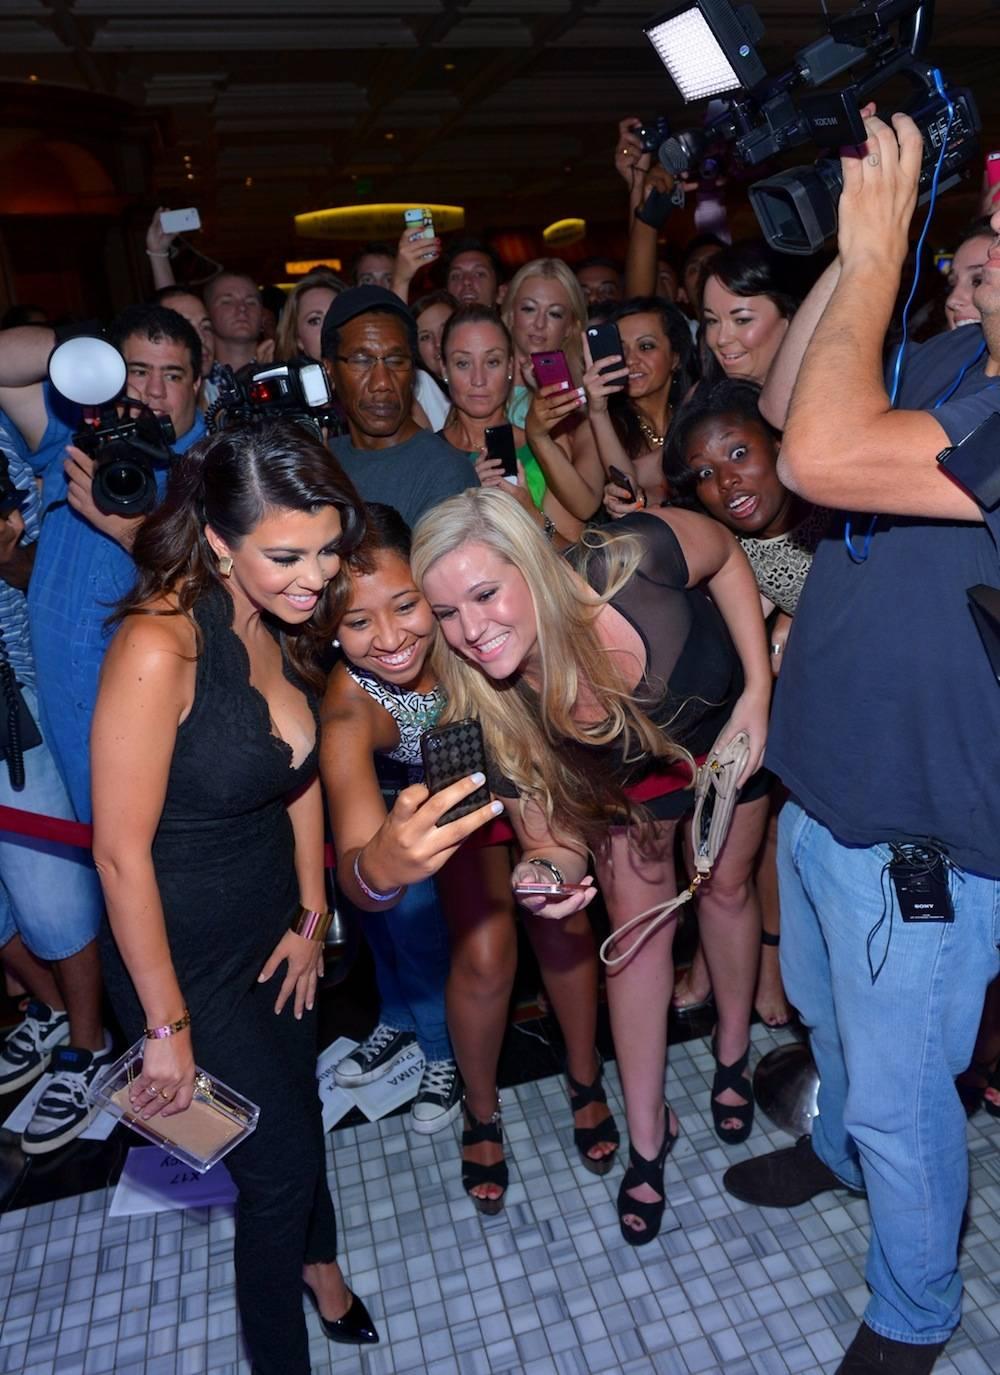 Kourtney Kardashian w fans at Hyde Bellagio, Las Vegas, 8.31.13, credit-Bryan Steffy, GettyWireImage